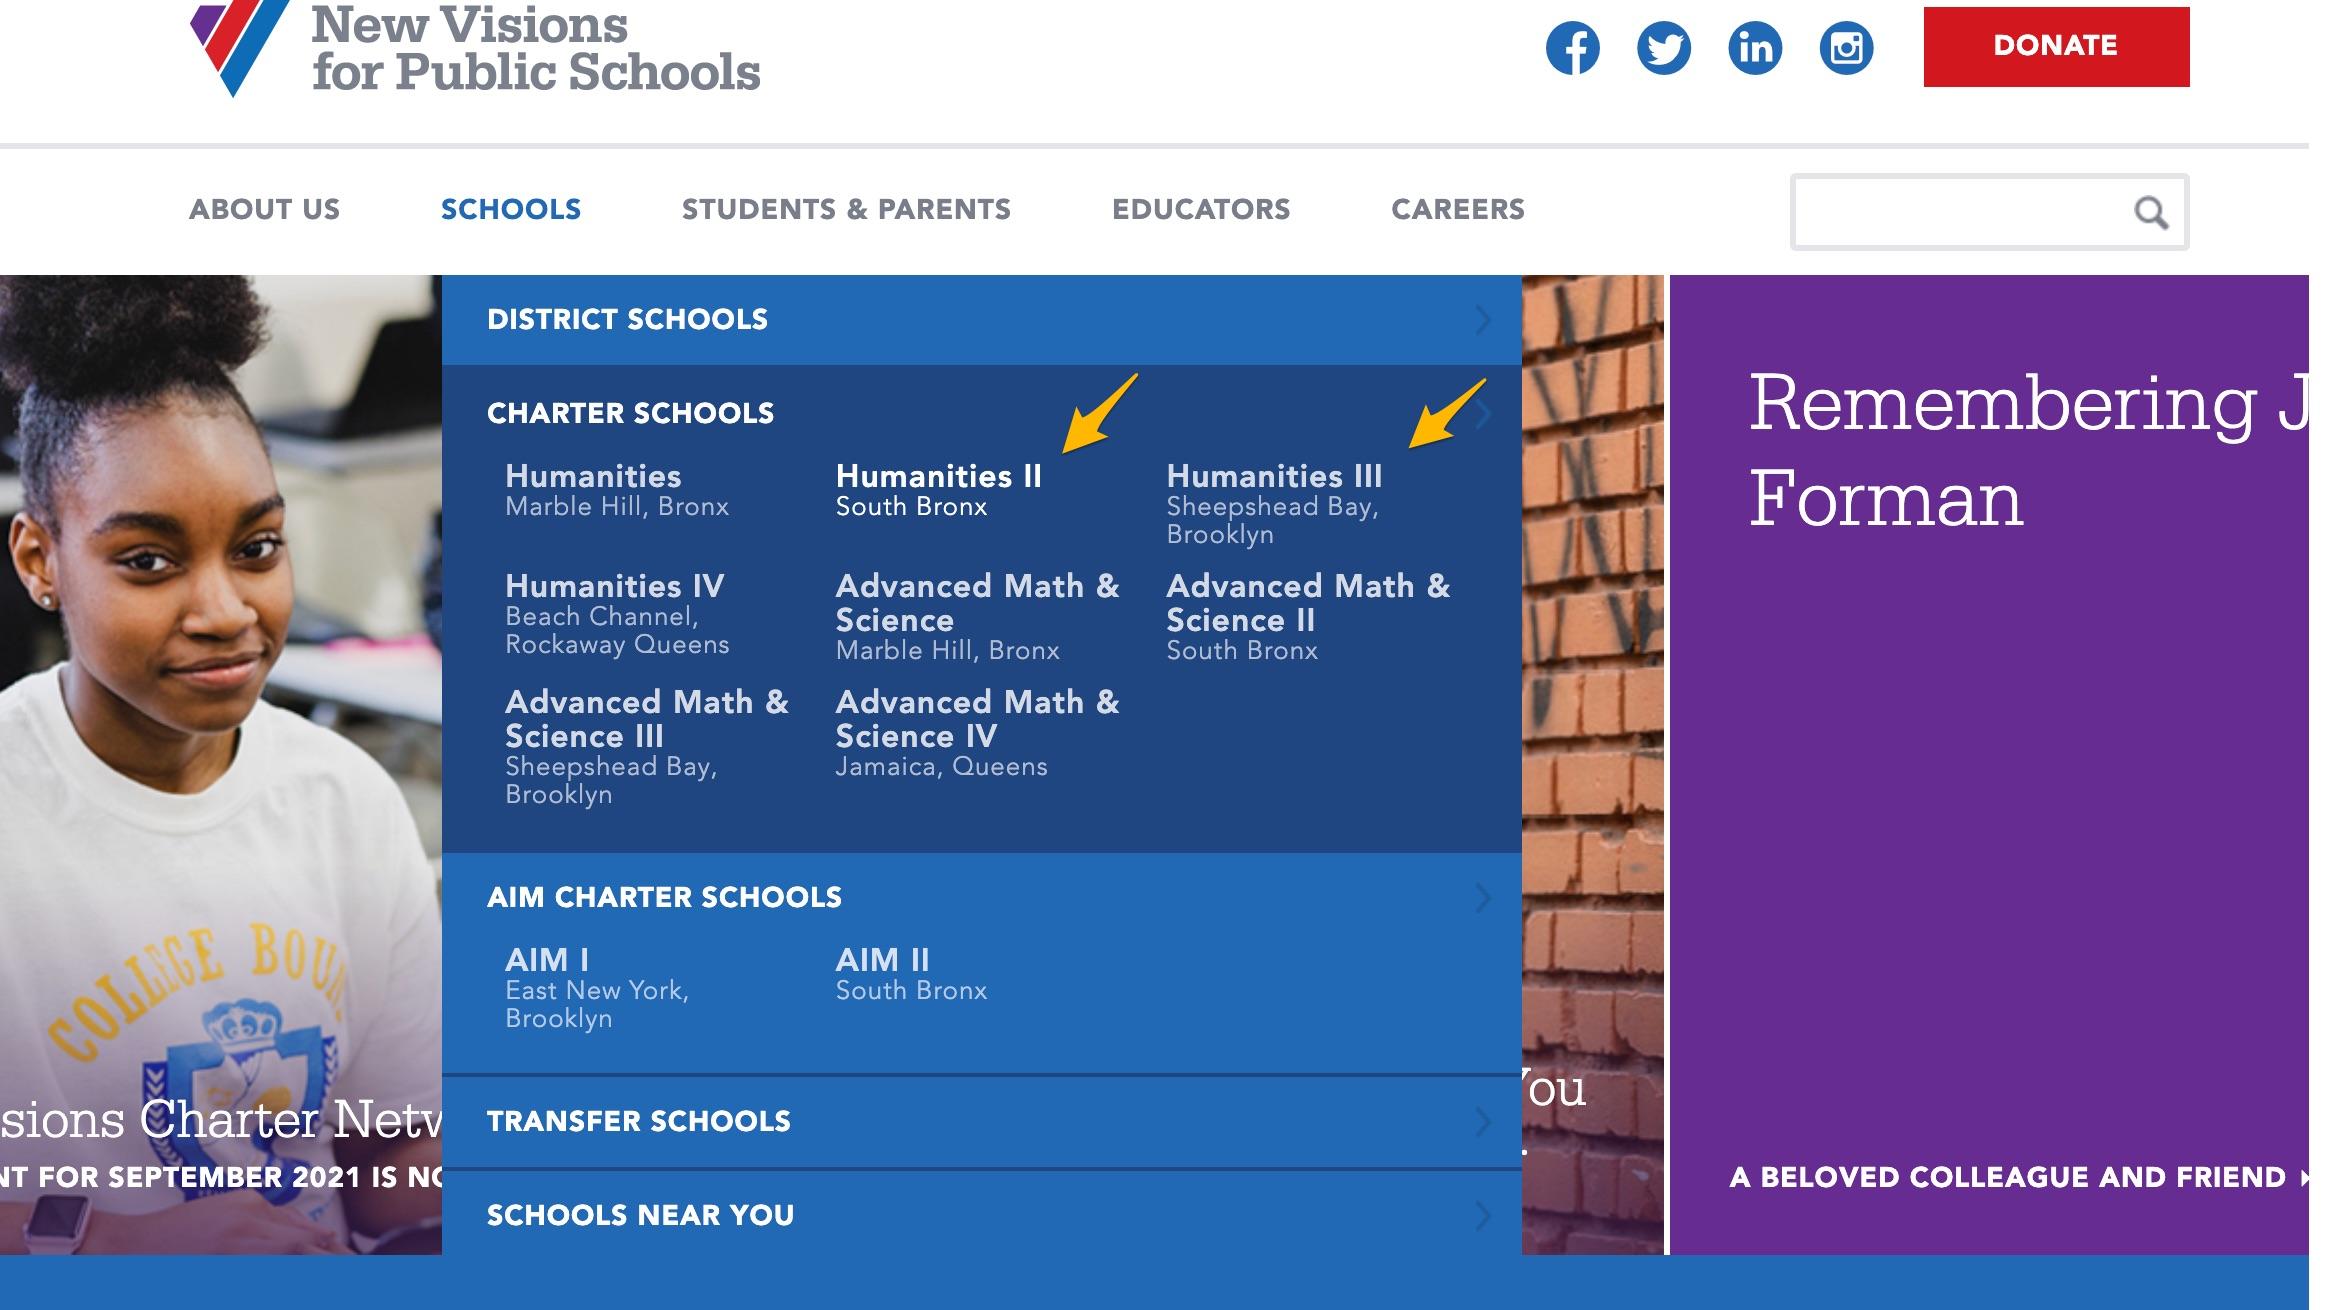 New Visions for Public Schools double dropdown menu example